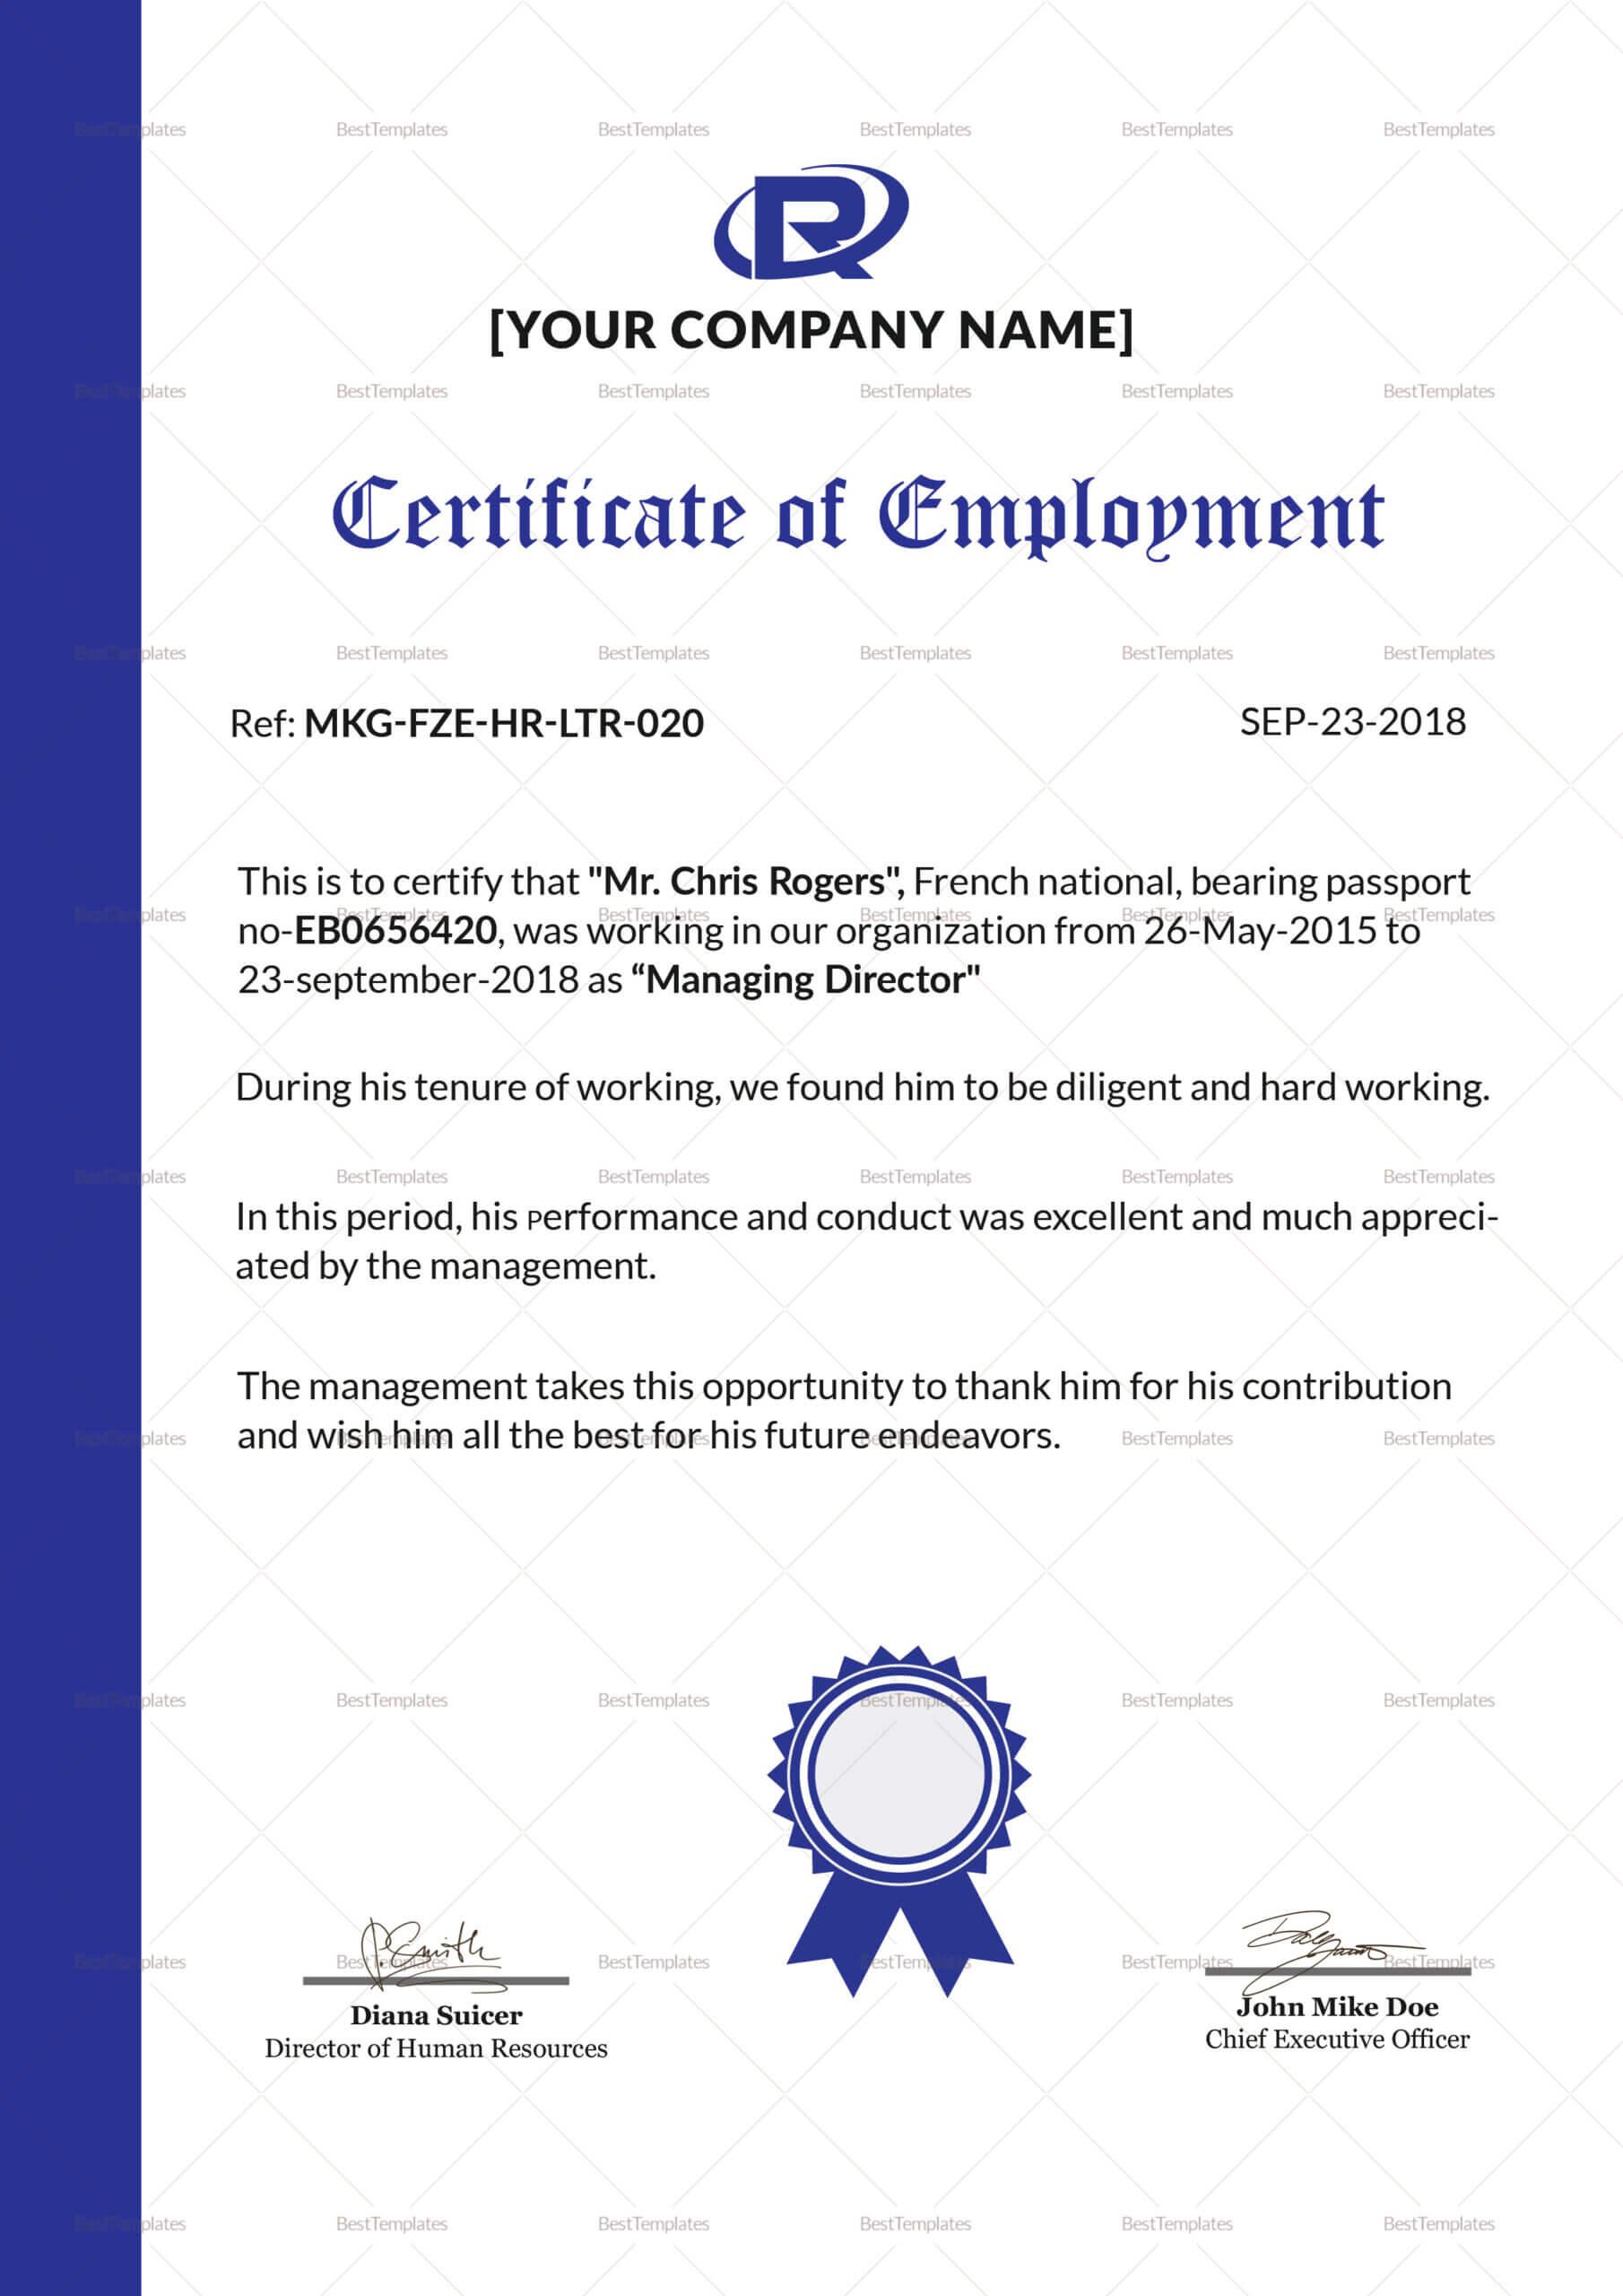 Employment Certificate Template - Zohre.horizonconsulting.co With Certificate Of Employment Template